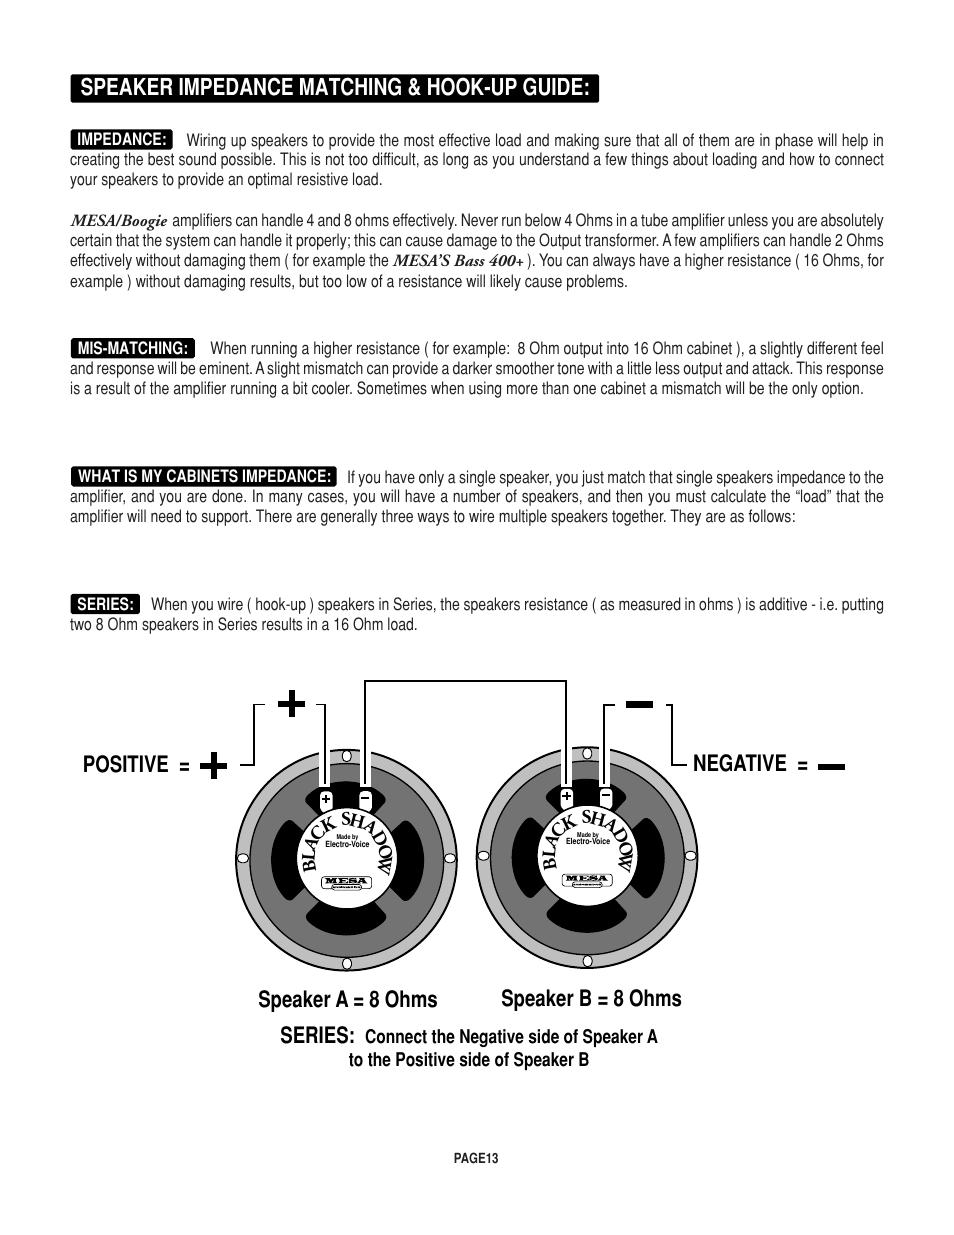 medium resolution of speaker impedance matching hook up guide speaker a 8 ohms speaker b 8 ohms series positive negative mesa boogie rectifier stereo user manual